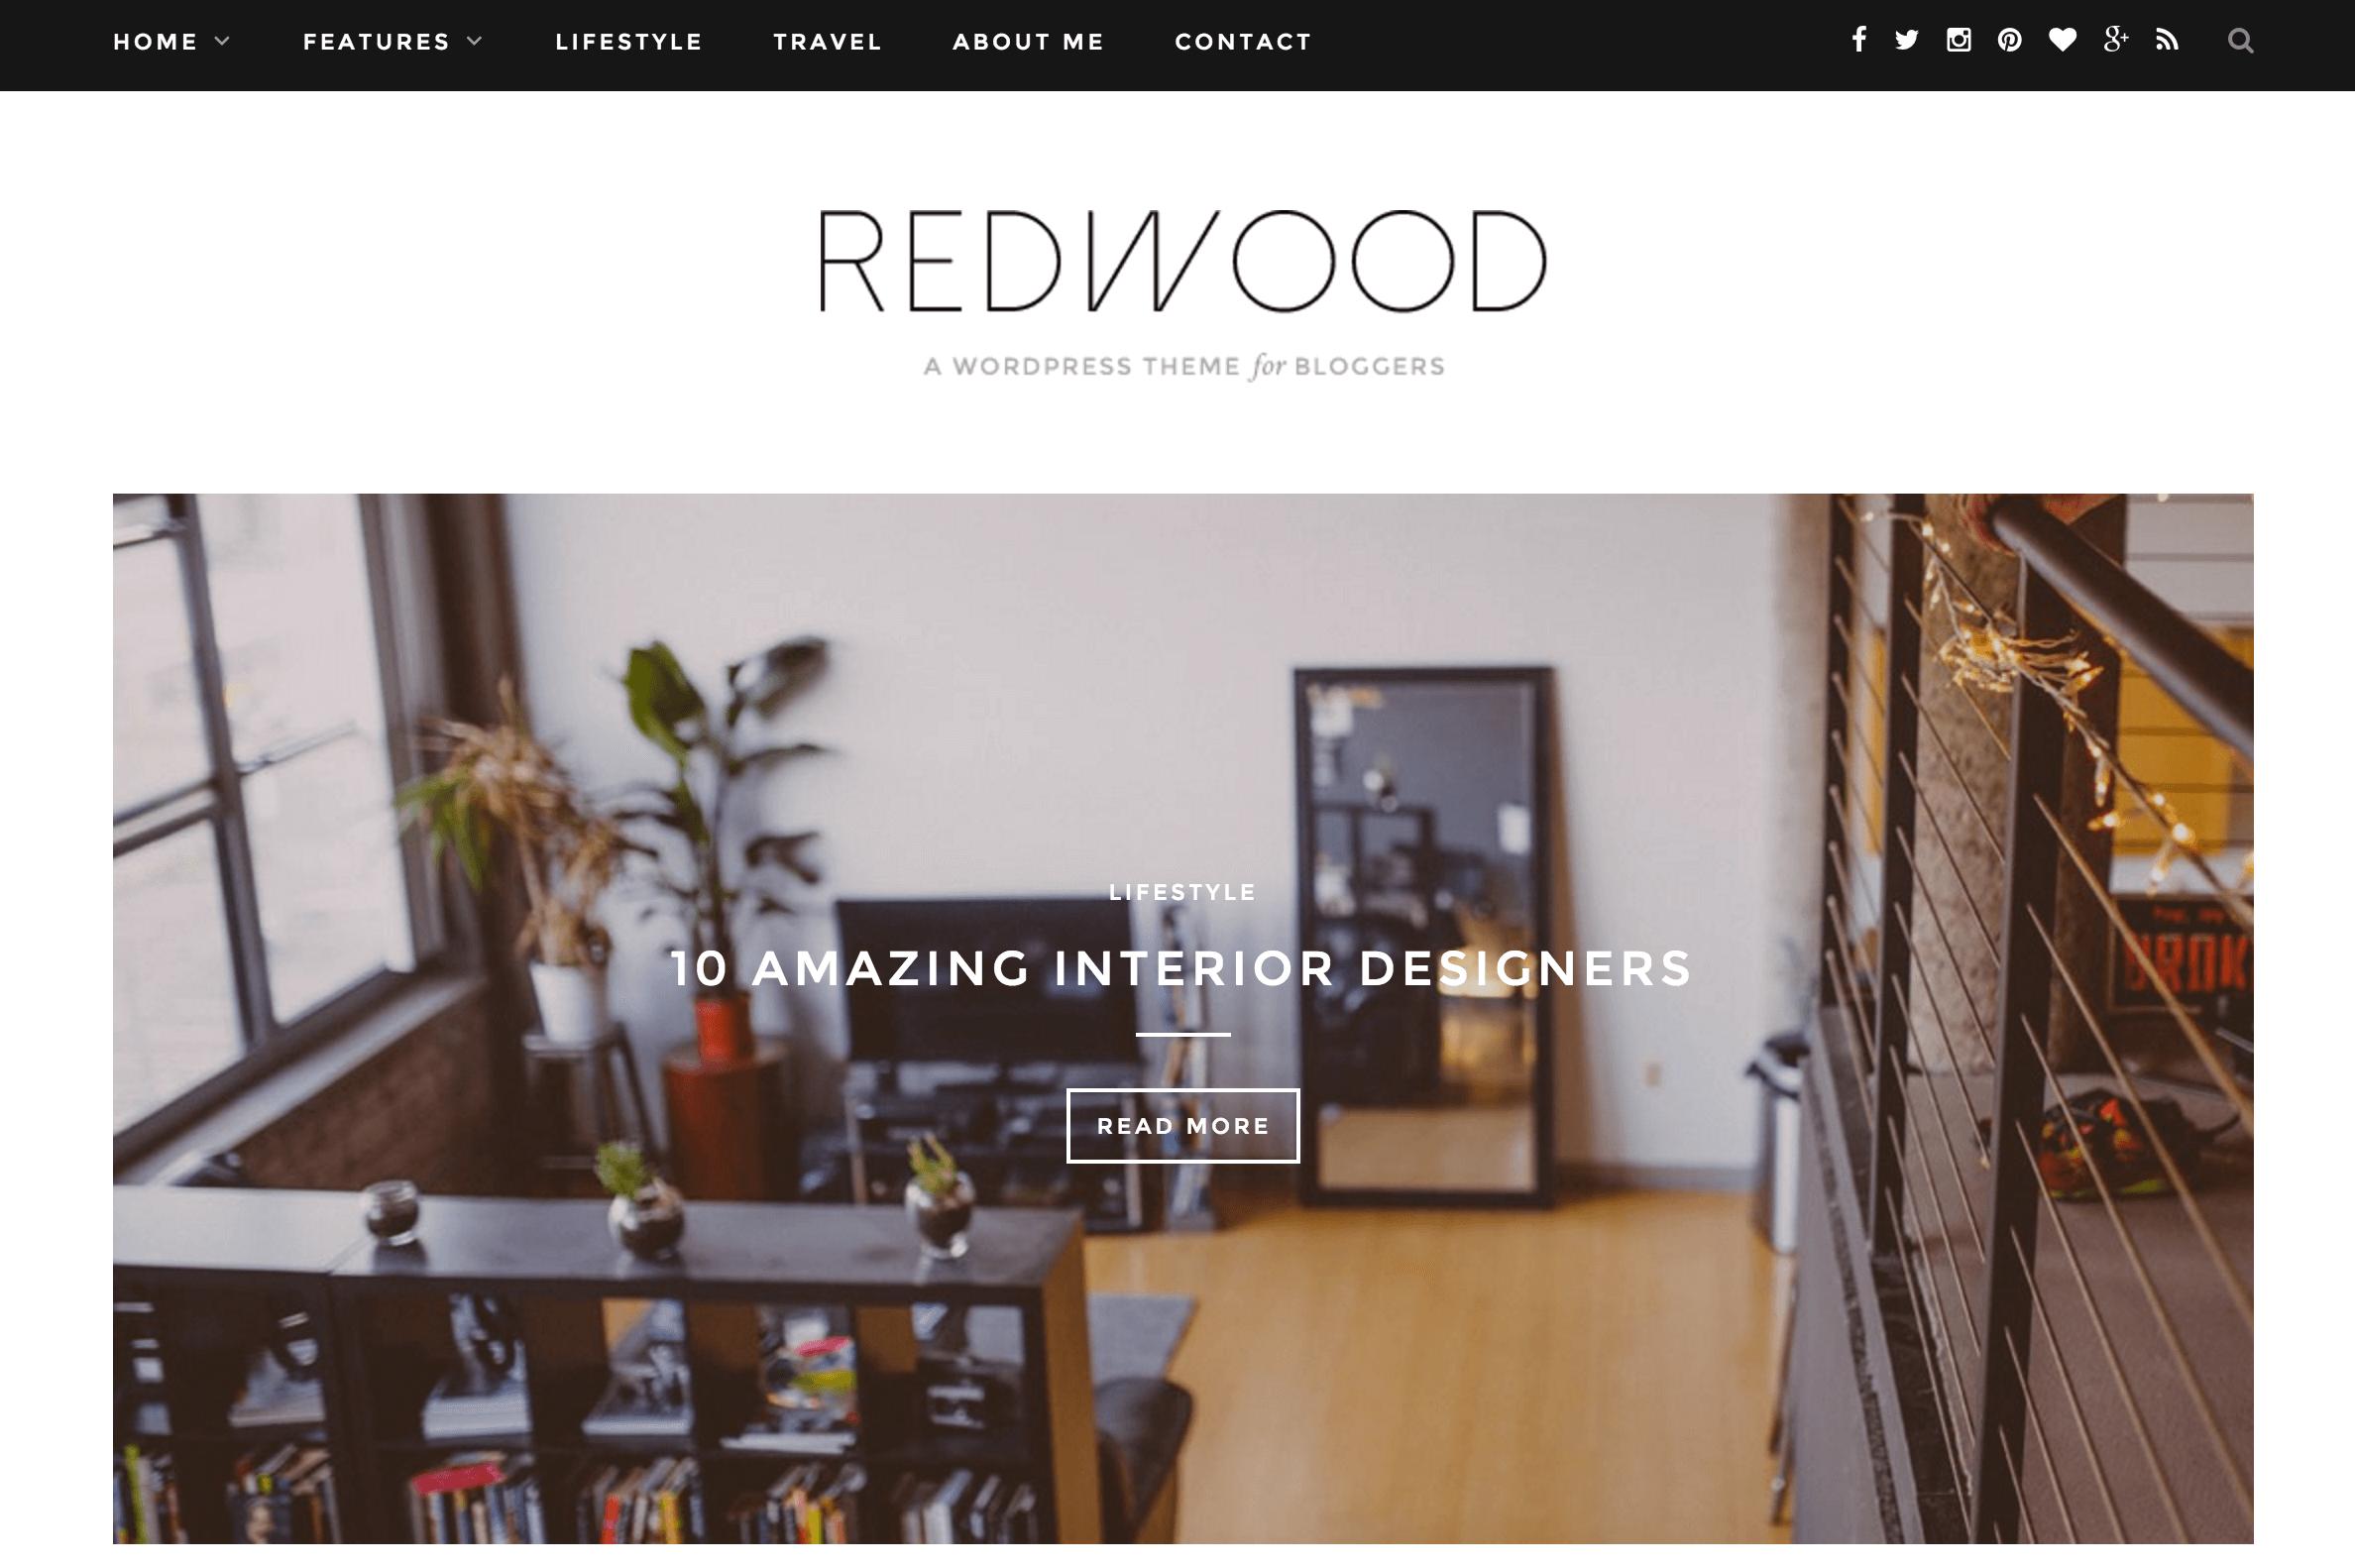 A screenshot of the Redwood theme.